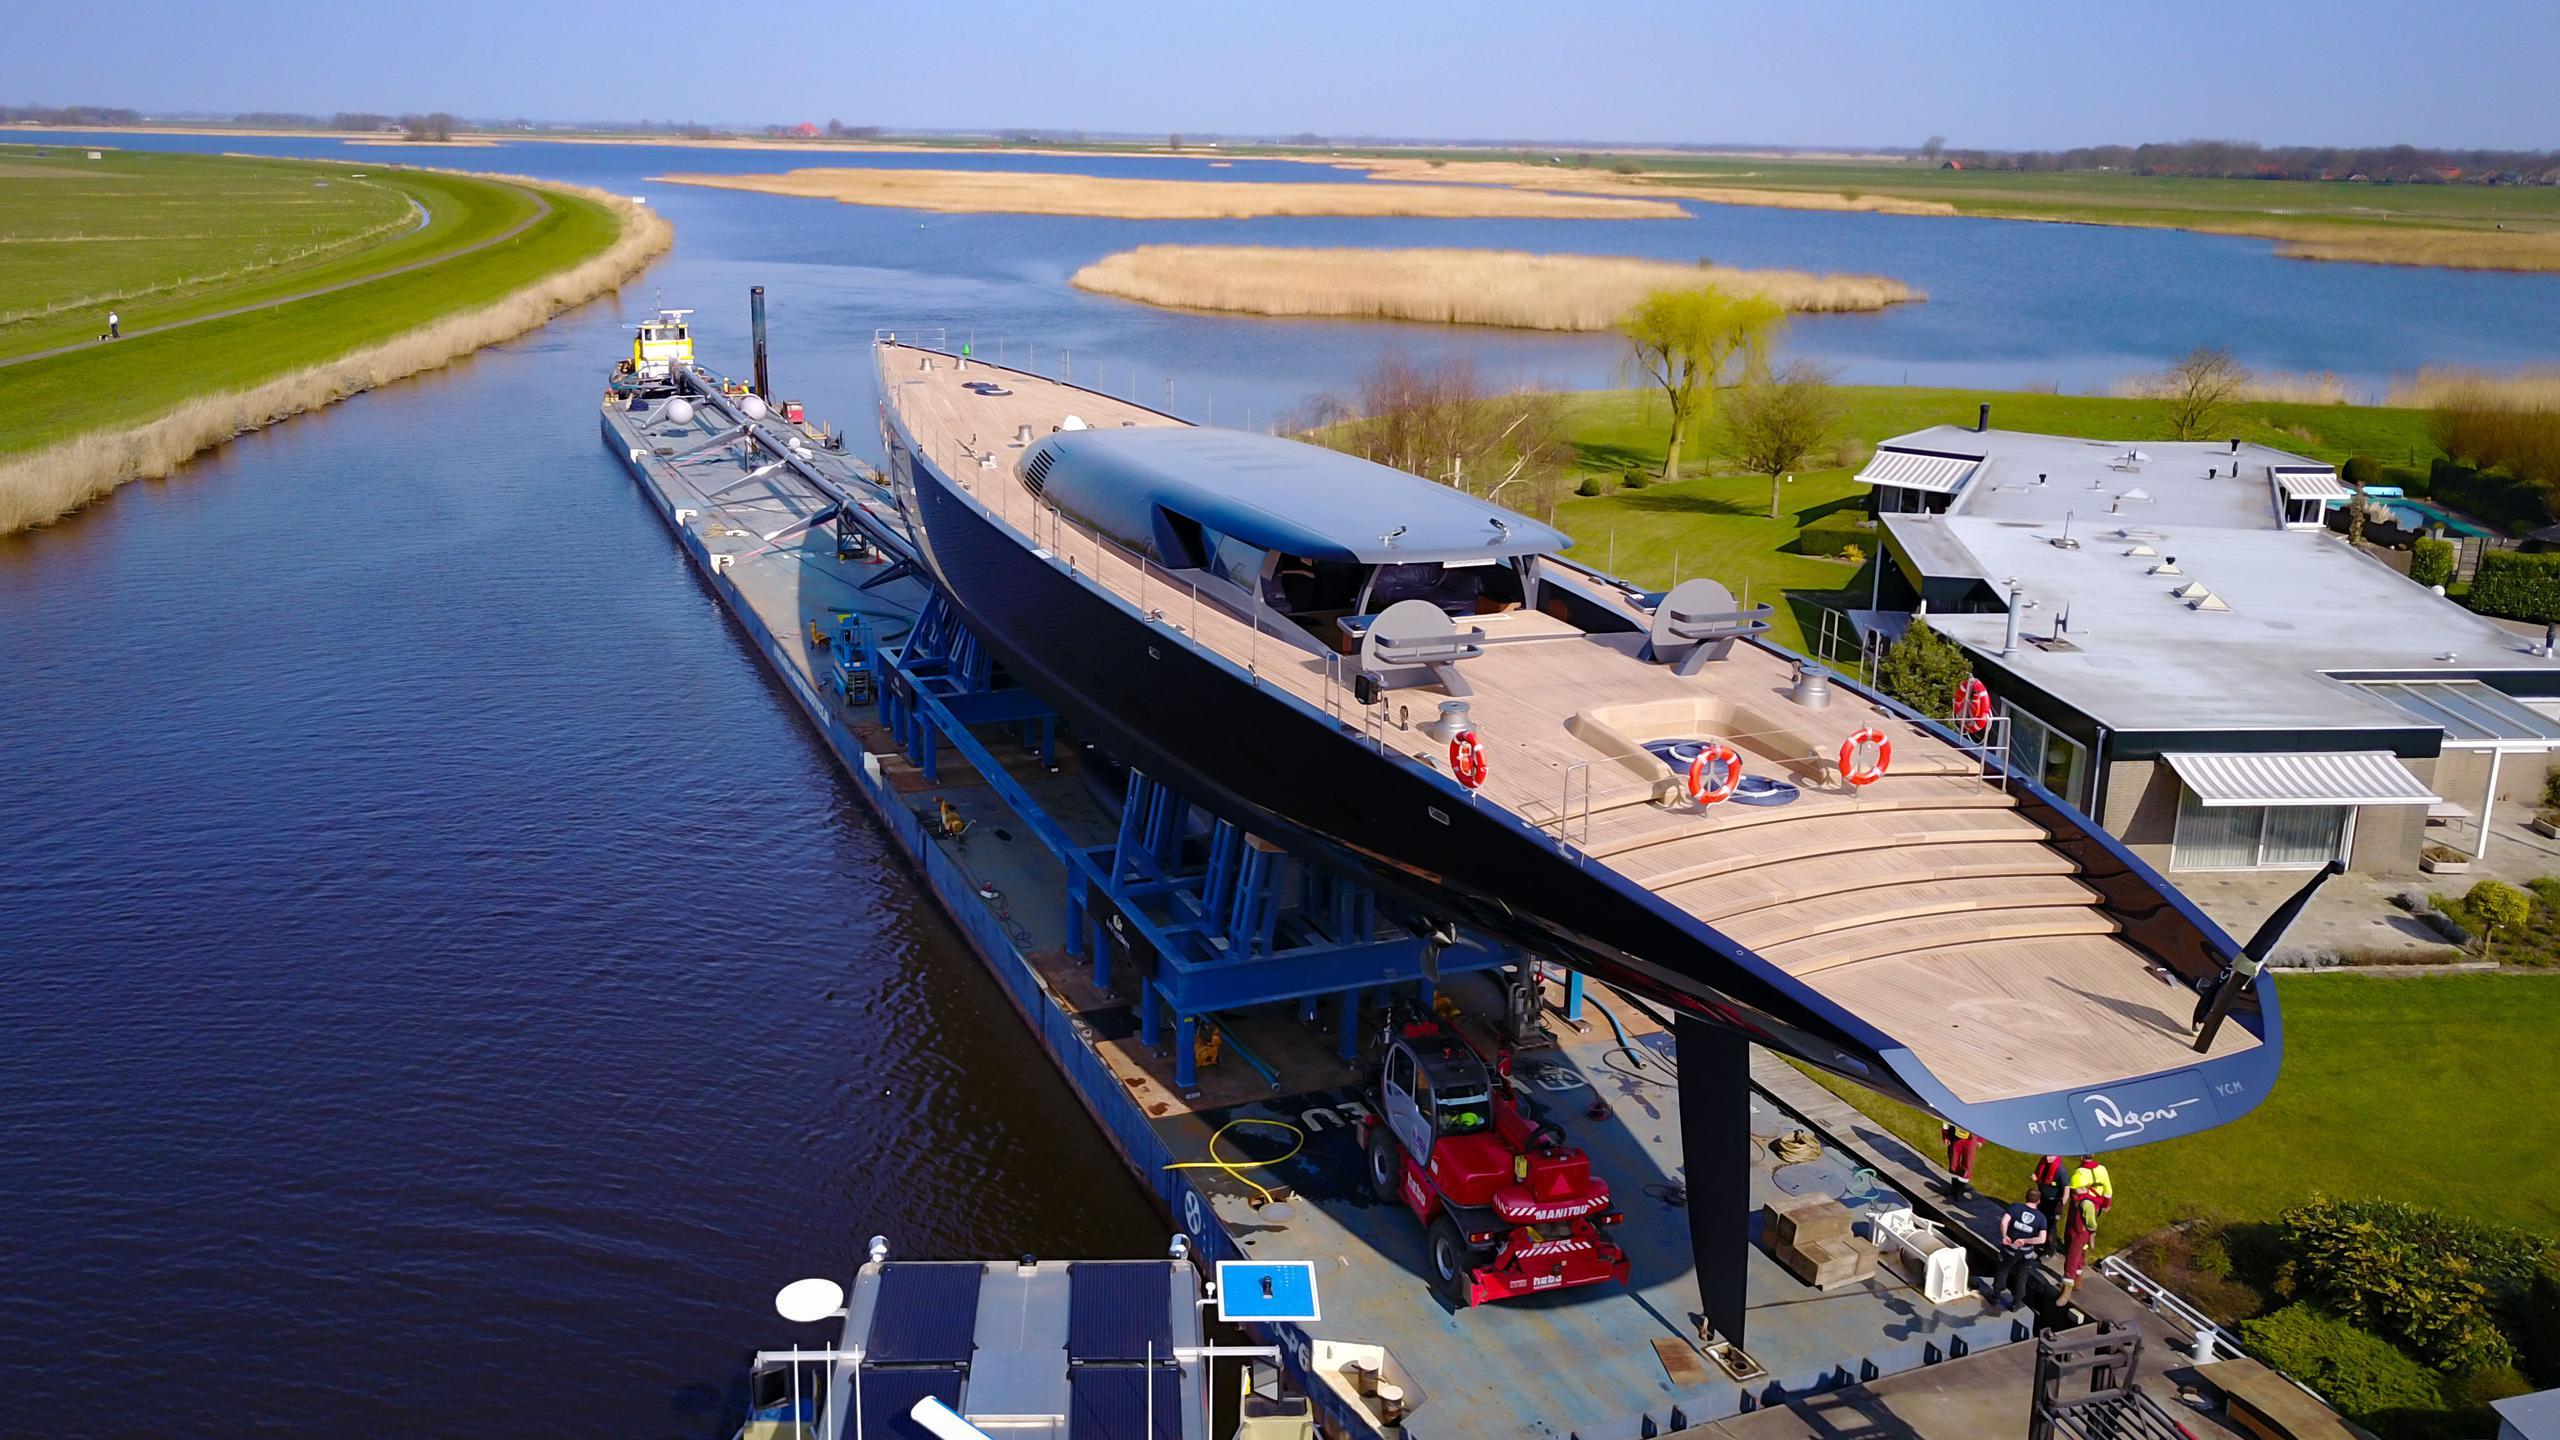 ngoni sailing yacht royal huisman 58m 2017 launch half stern